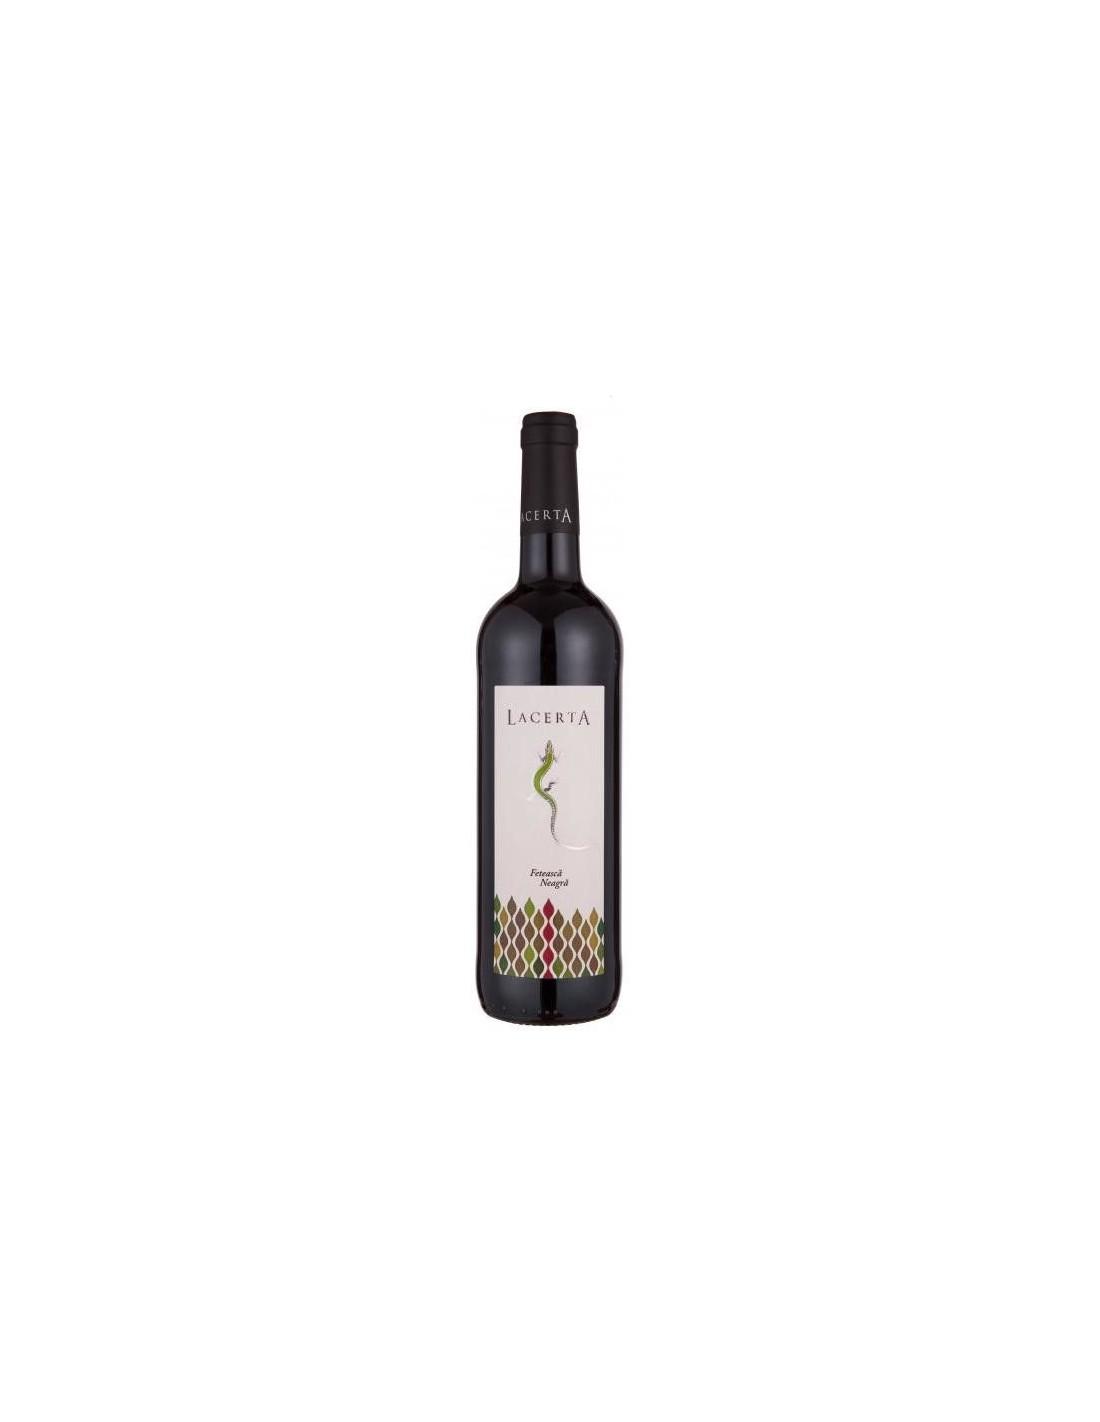 Vin rosu, Feteasca Neagra, Lacerta Dealu Mare, 2016, 0.75L, 14.2% alc., Romania